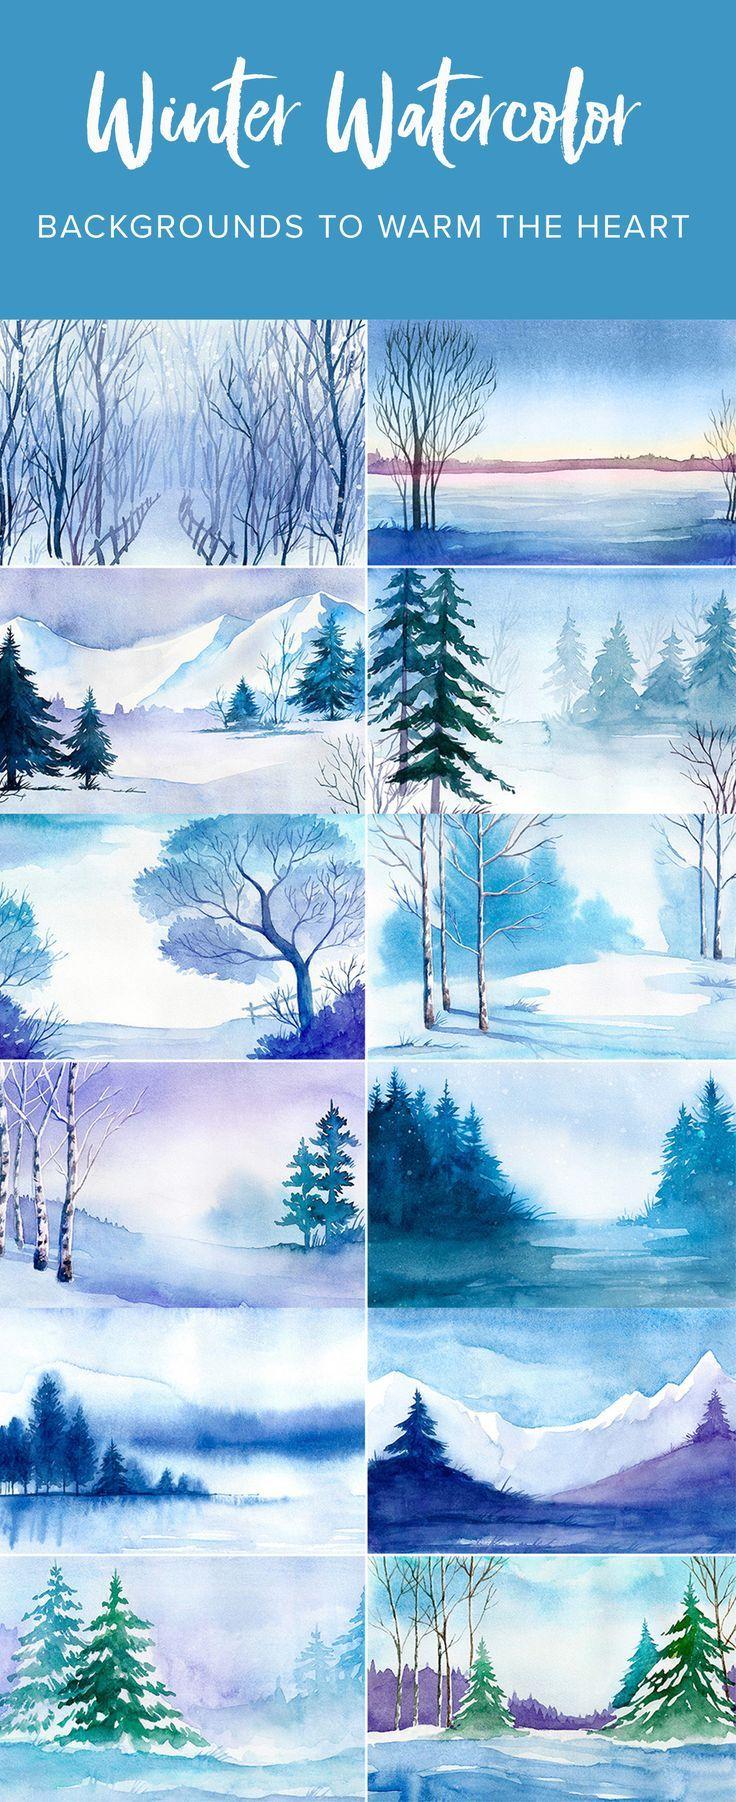 Aquarell-Winterlandschaften Vol.1: 12 Winter-Aquarell-Vektorlandschaften